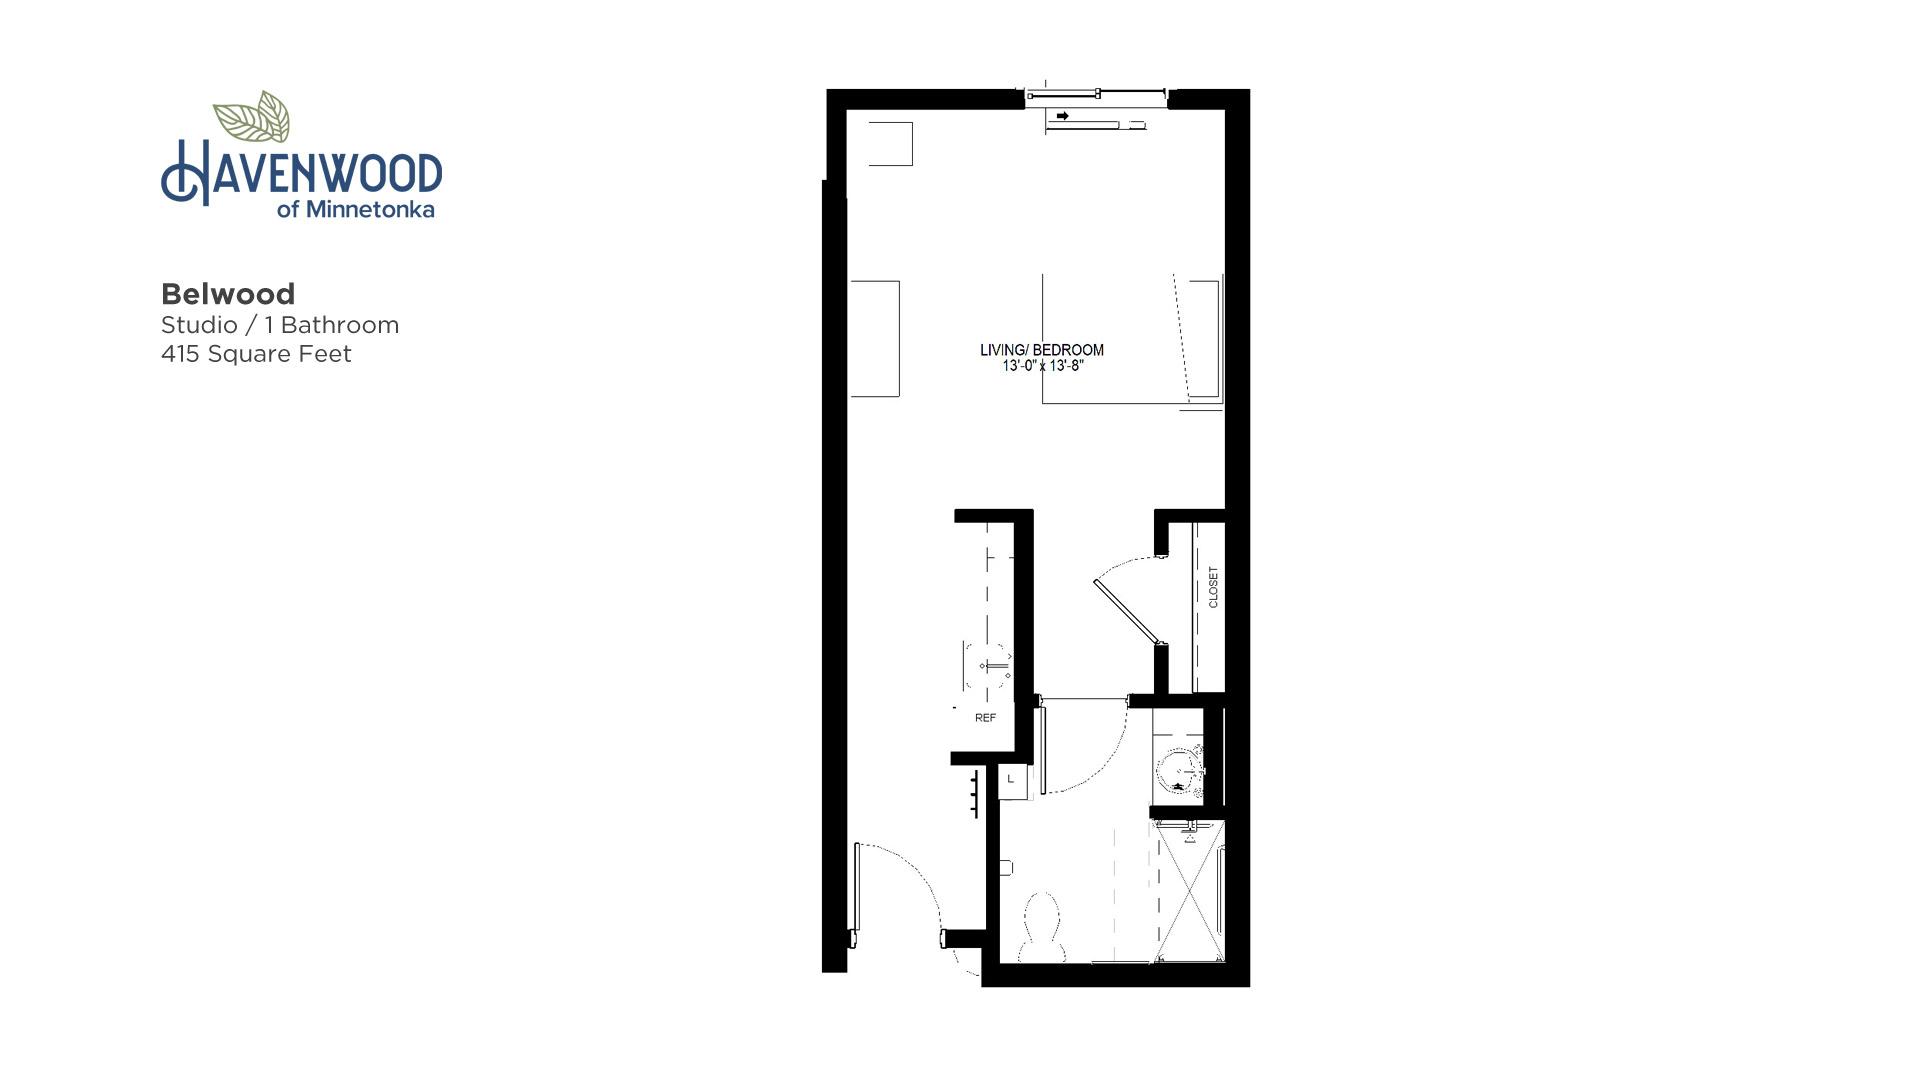 Havenwood of Minnetonka Belwood Floor Plan